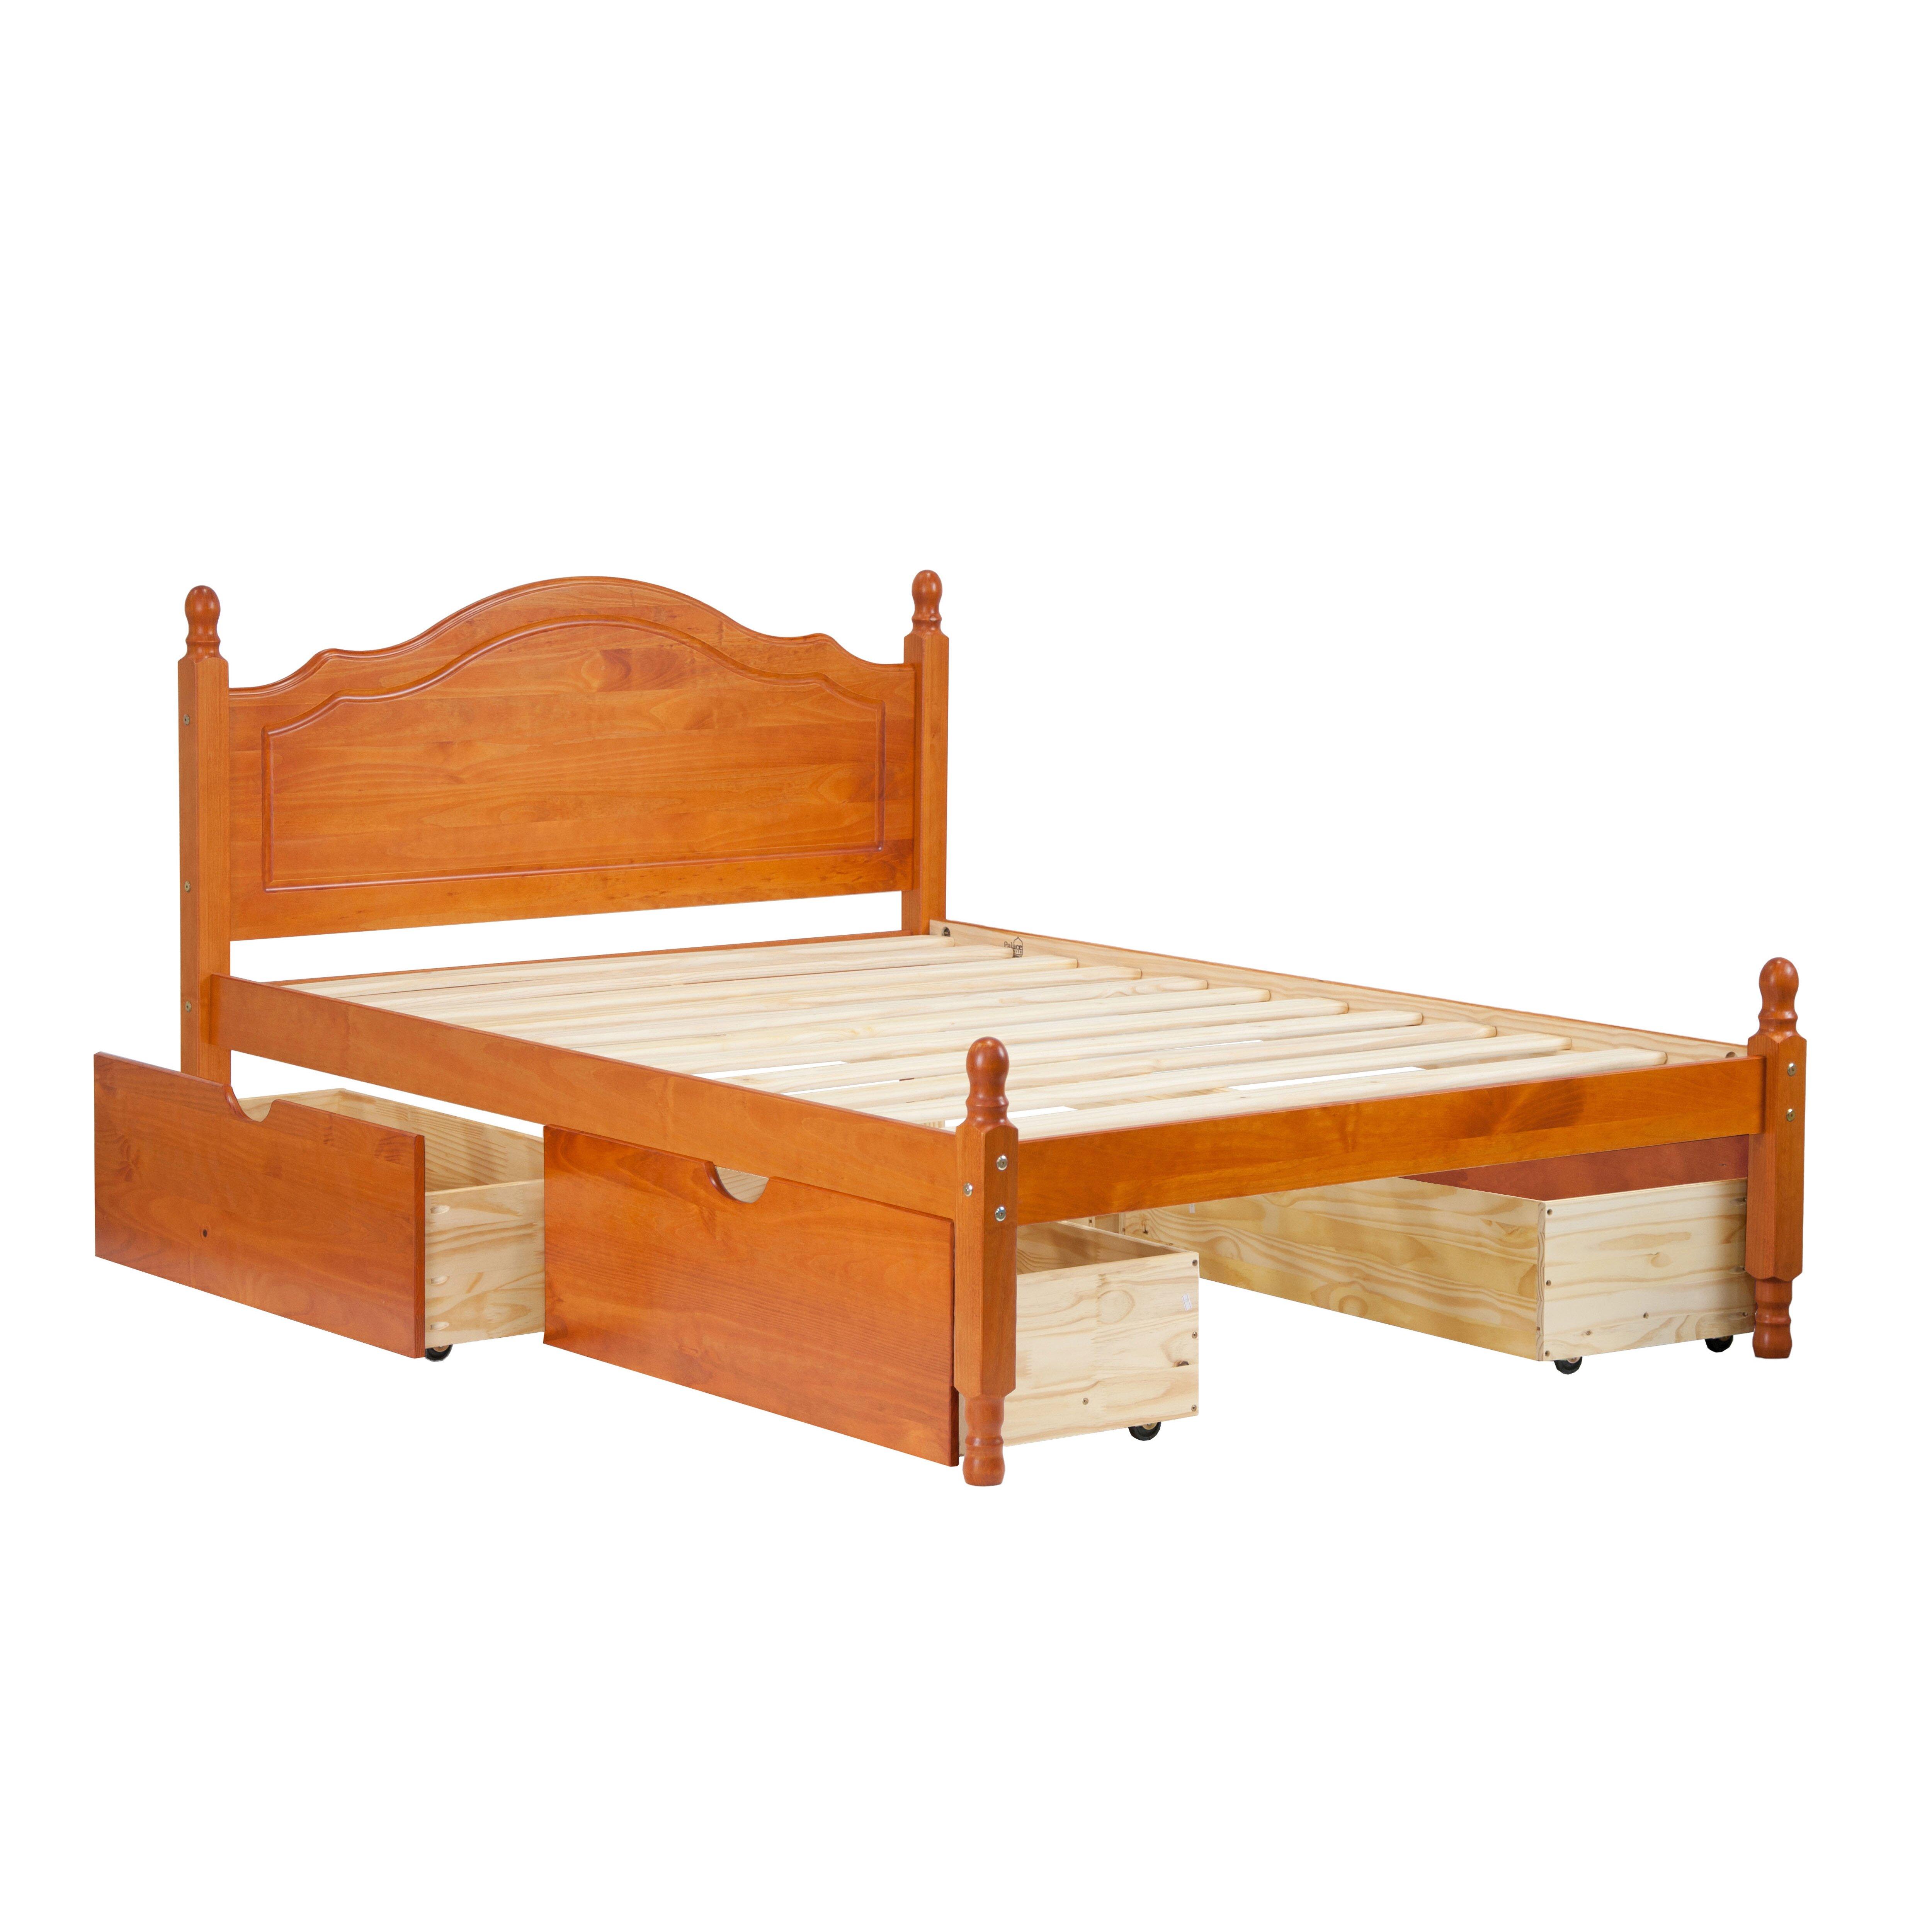 Wonderful image of Baby & Kids Kids' Bedroom Furniture Gender Neutral Kids' Beds  with #B5500C color and 5000x5000 pixels